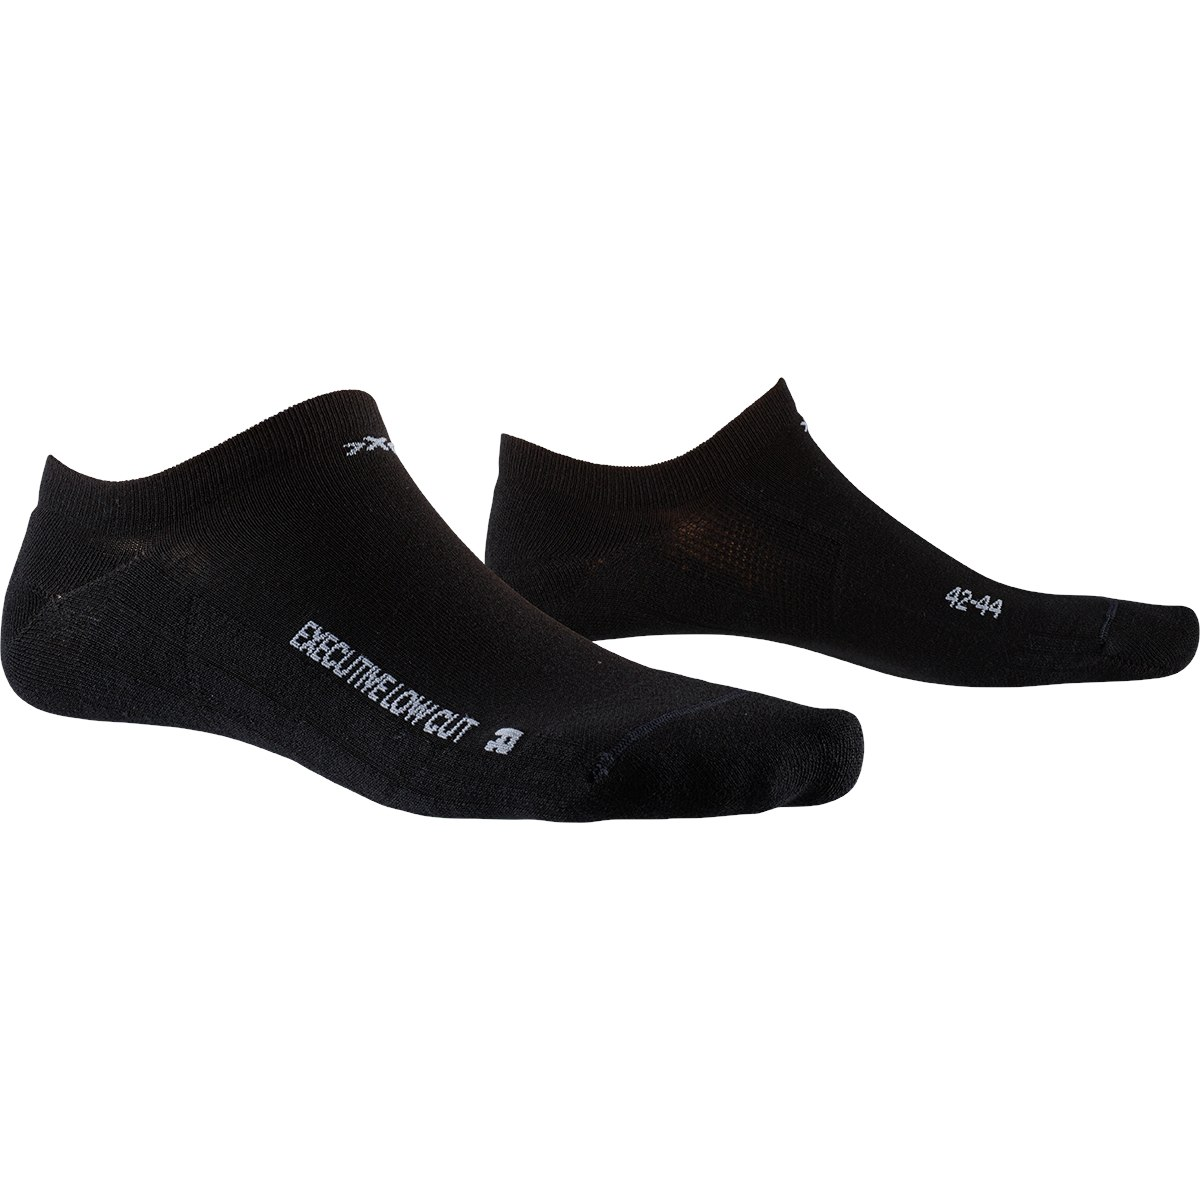 X-Socks Executive Low Cut Socken - black